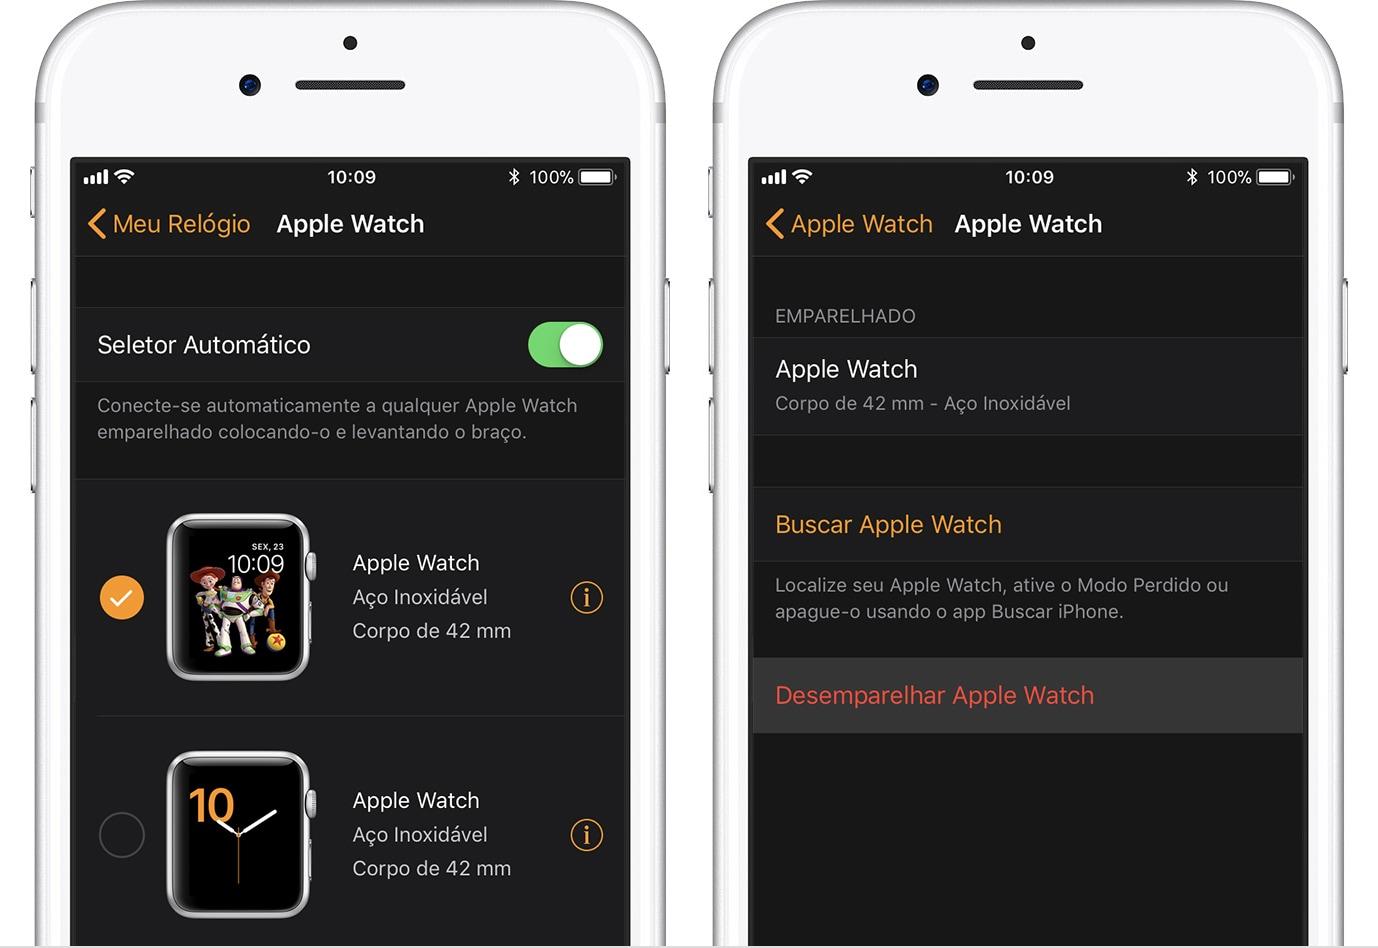 Unpairing the Apple Watch